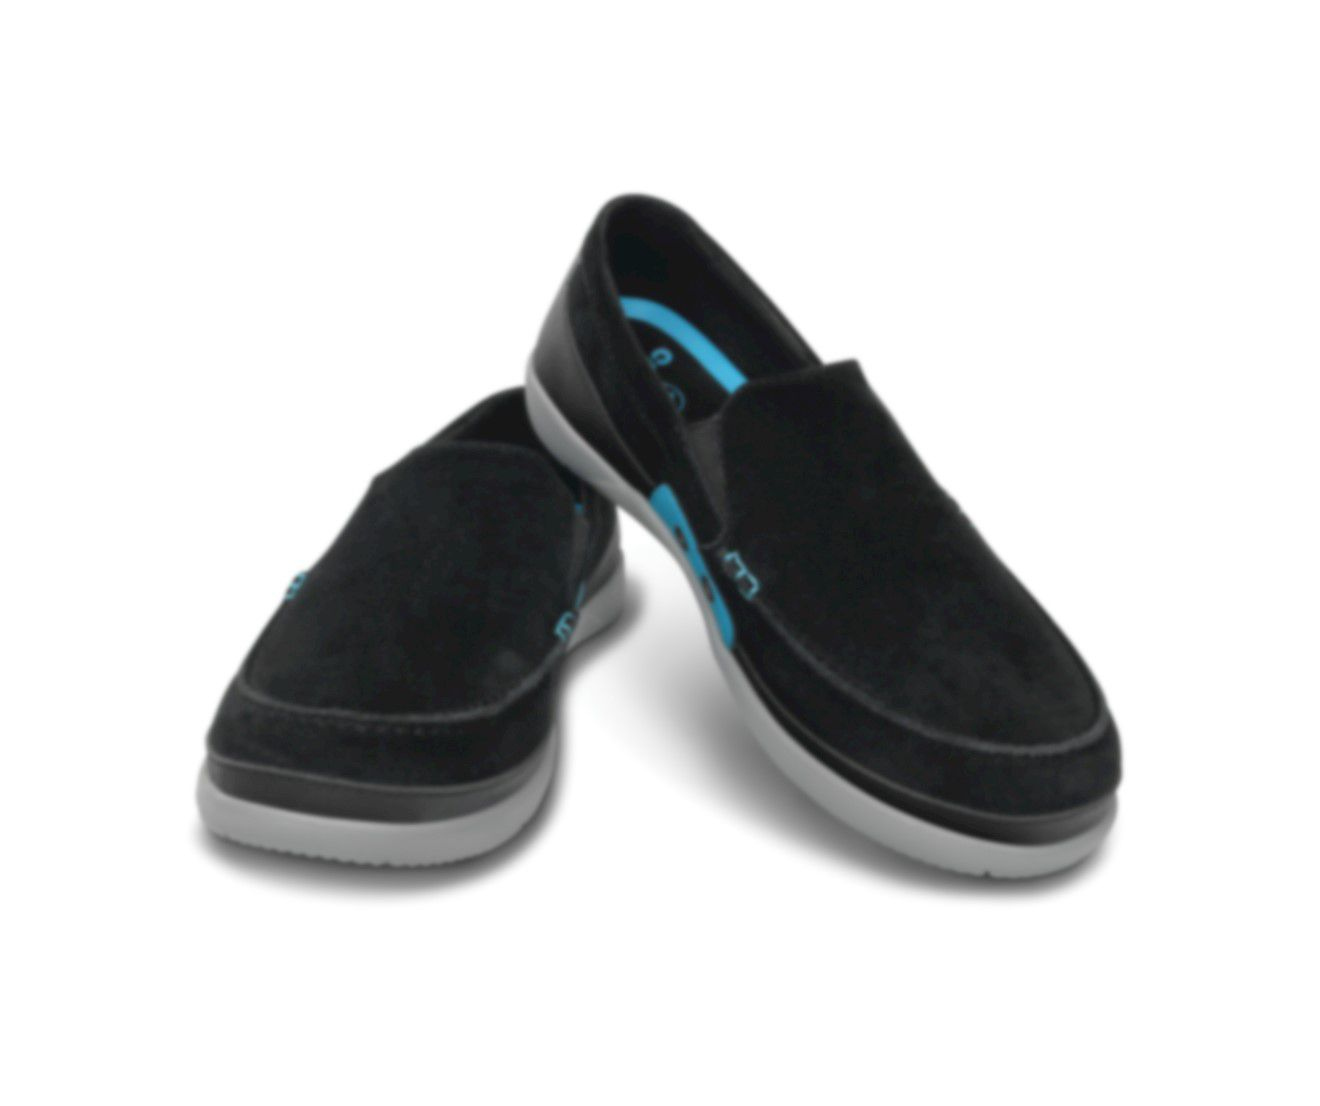 Sapato Crocs Masculino Walu Accent Suede Loafer Black